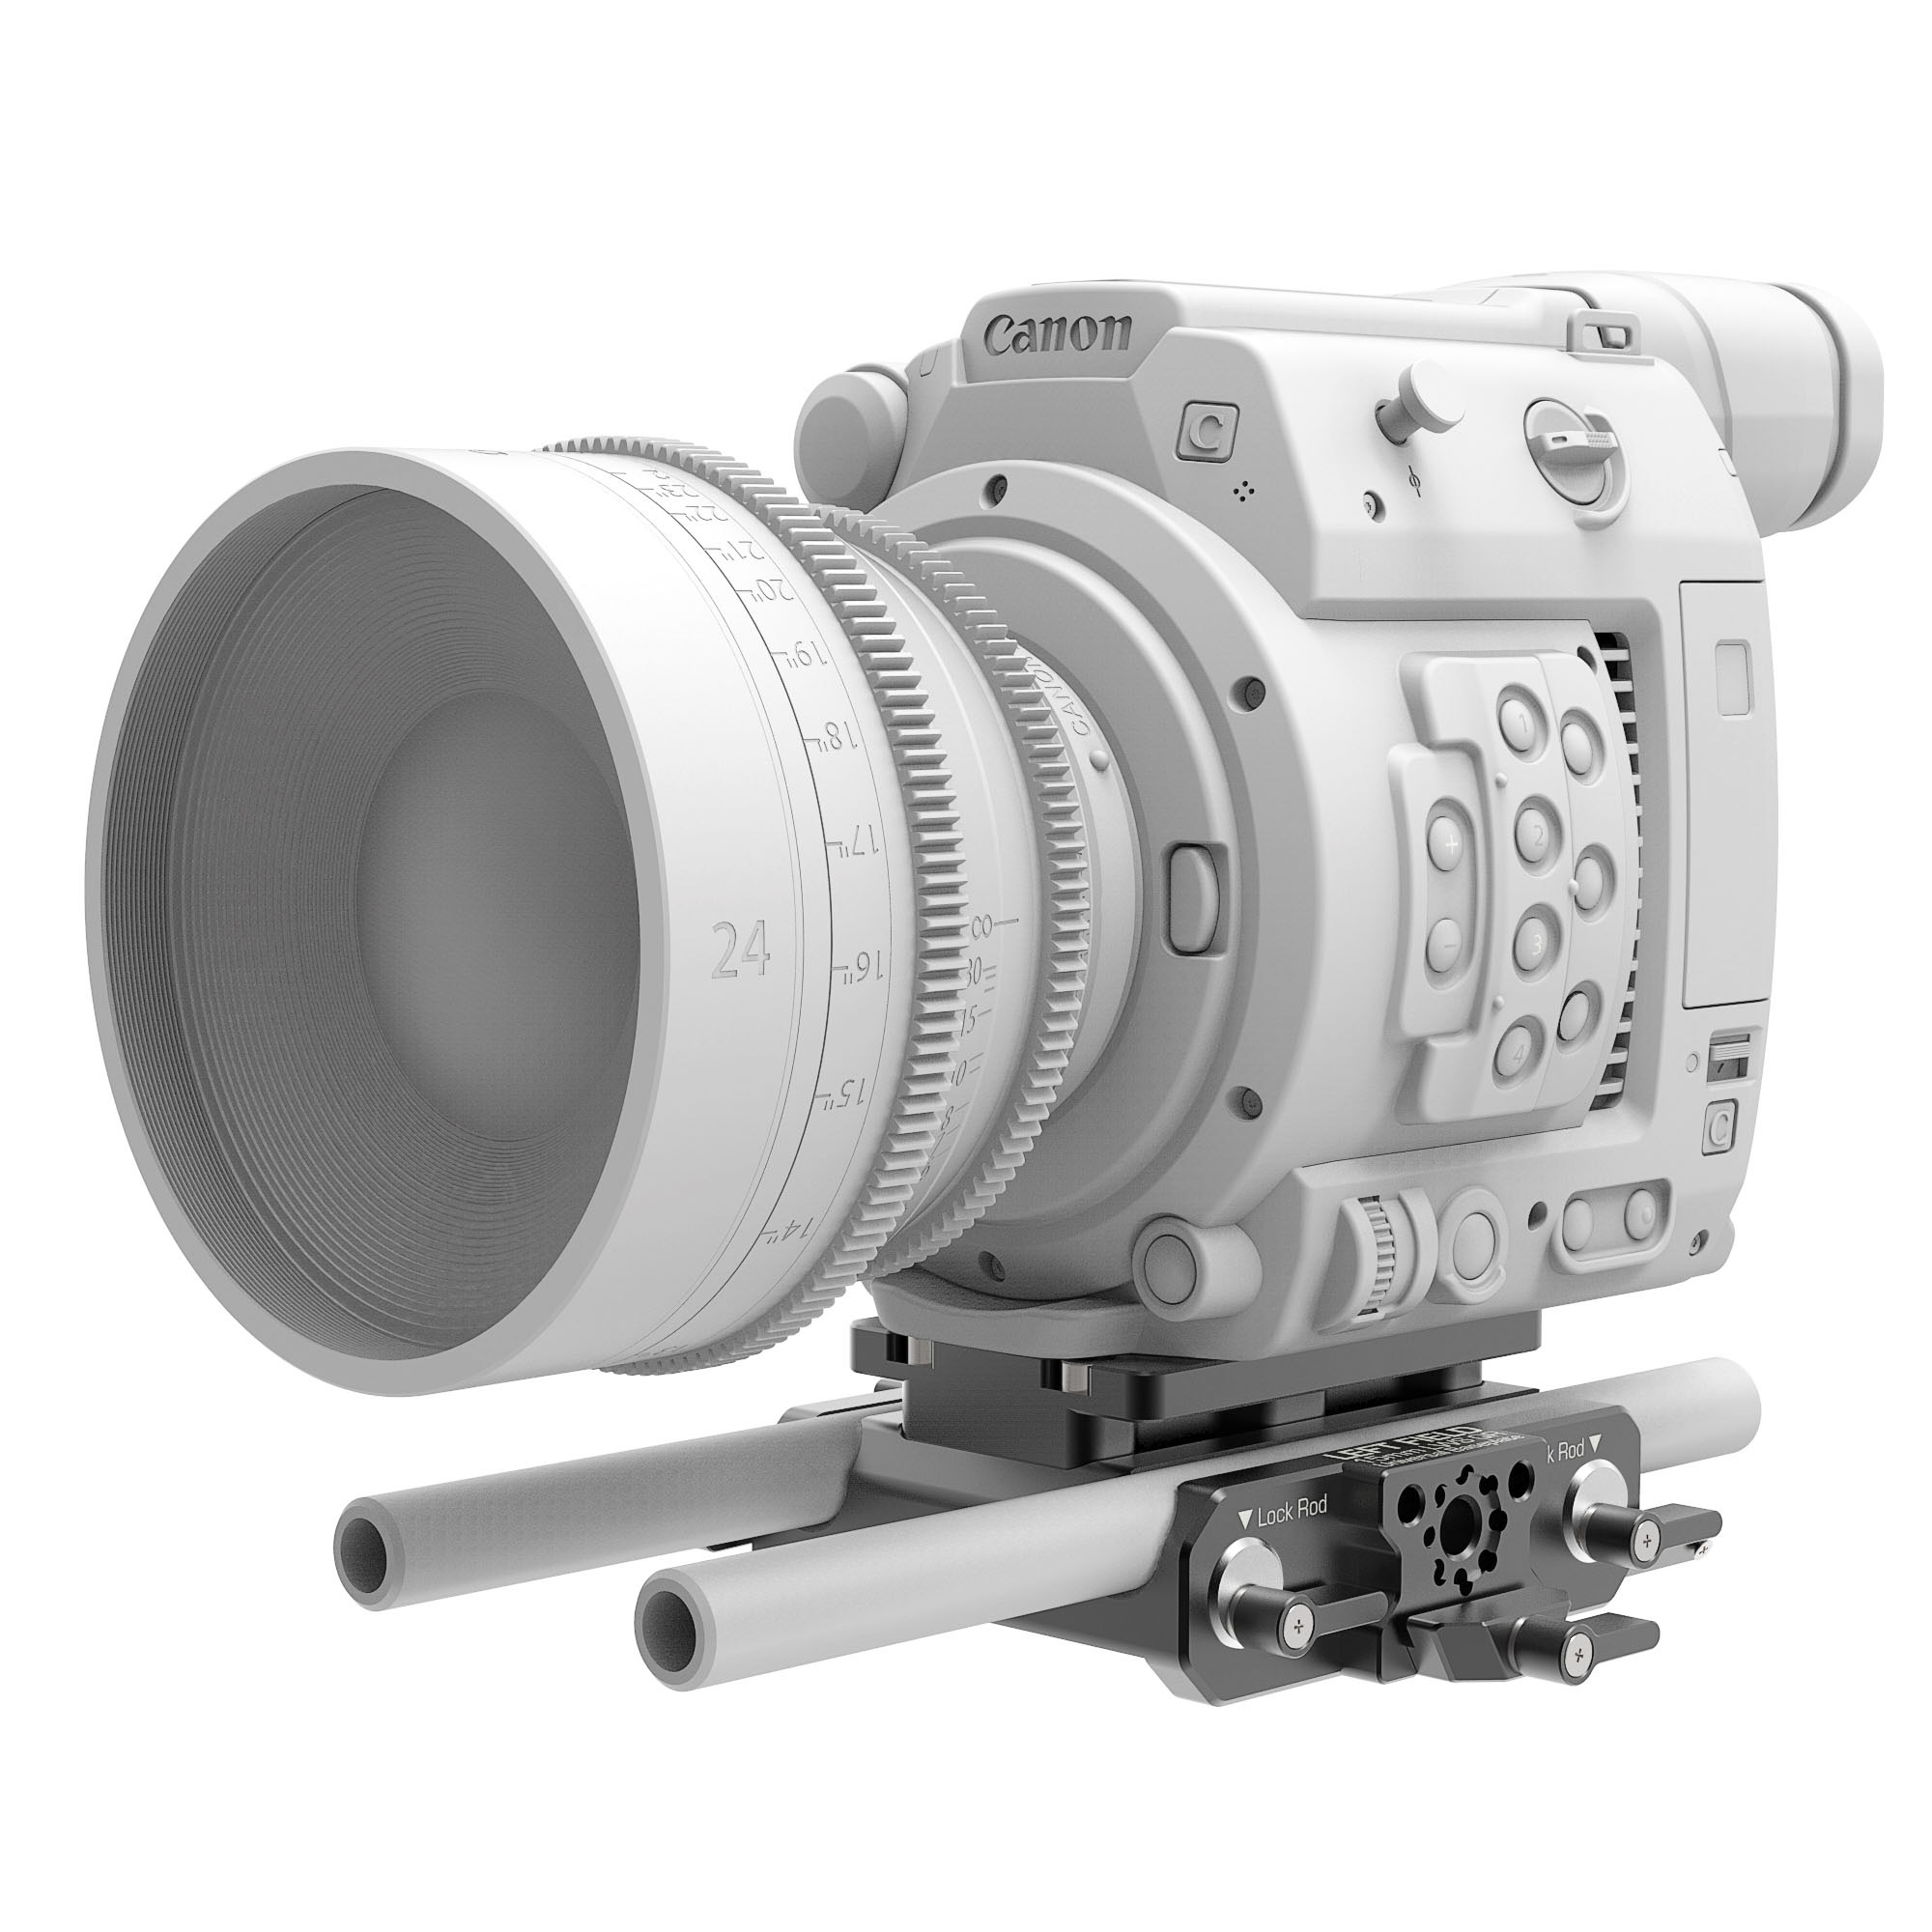 B4005.0001 Canon C200 LWS sliding Baseplate 6 1